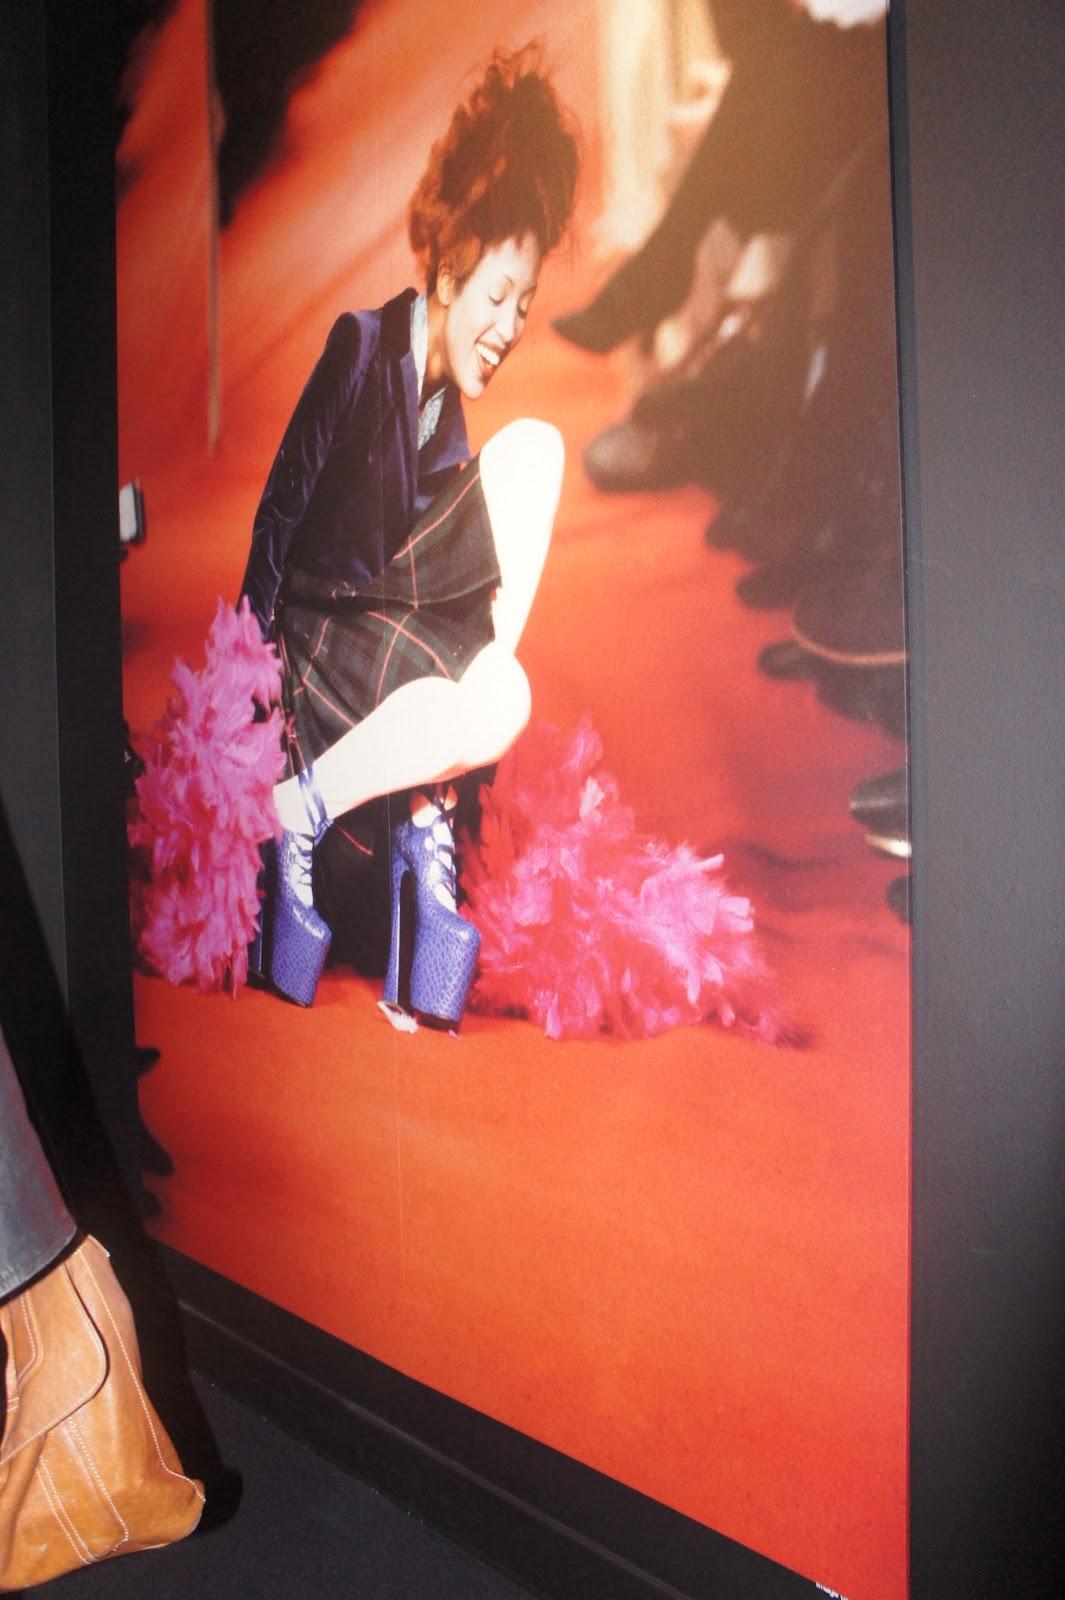 http://3.bp.blogspot.com/_4Bc8ECXYLUU/TJzIG6kMyDI/AAAAAAAAAn4/-qrGwOOpUxQ/s1600/Vivienne_westwood_exhibition_selfridges_jada_styles_naomi_campbell_fall.JPG